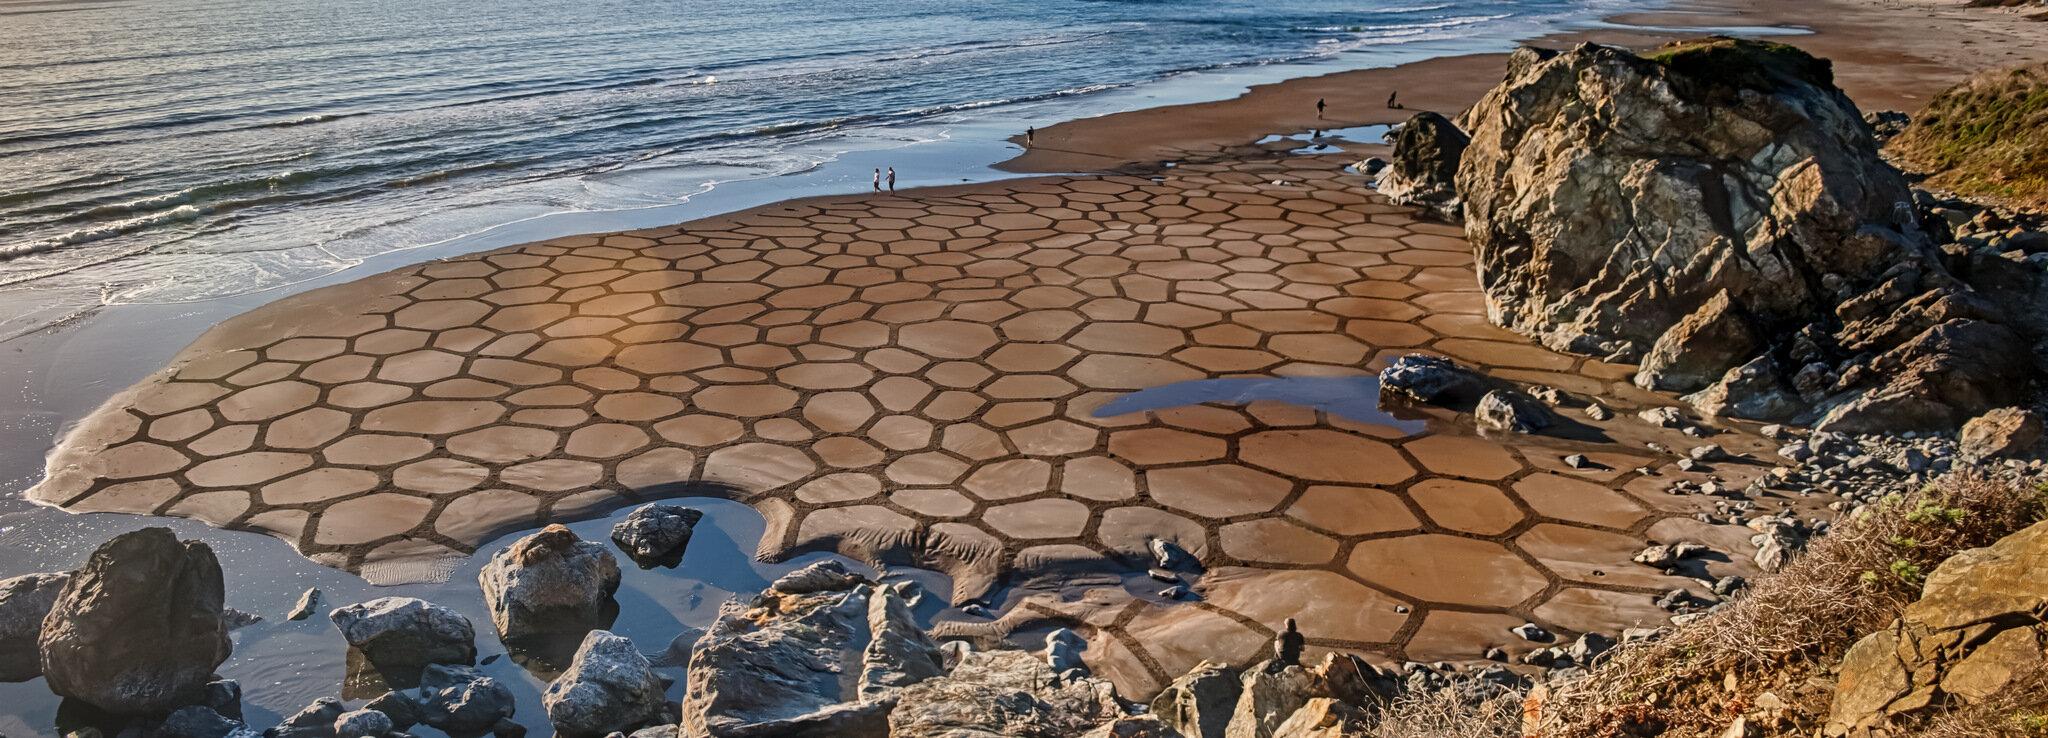 'Cells III', 2013. Stinson Beach, CA..jpg